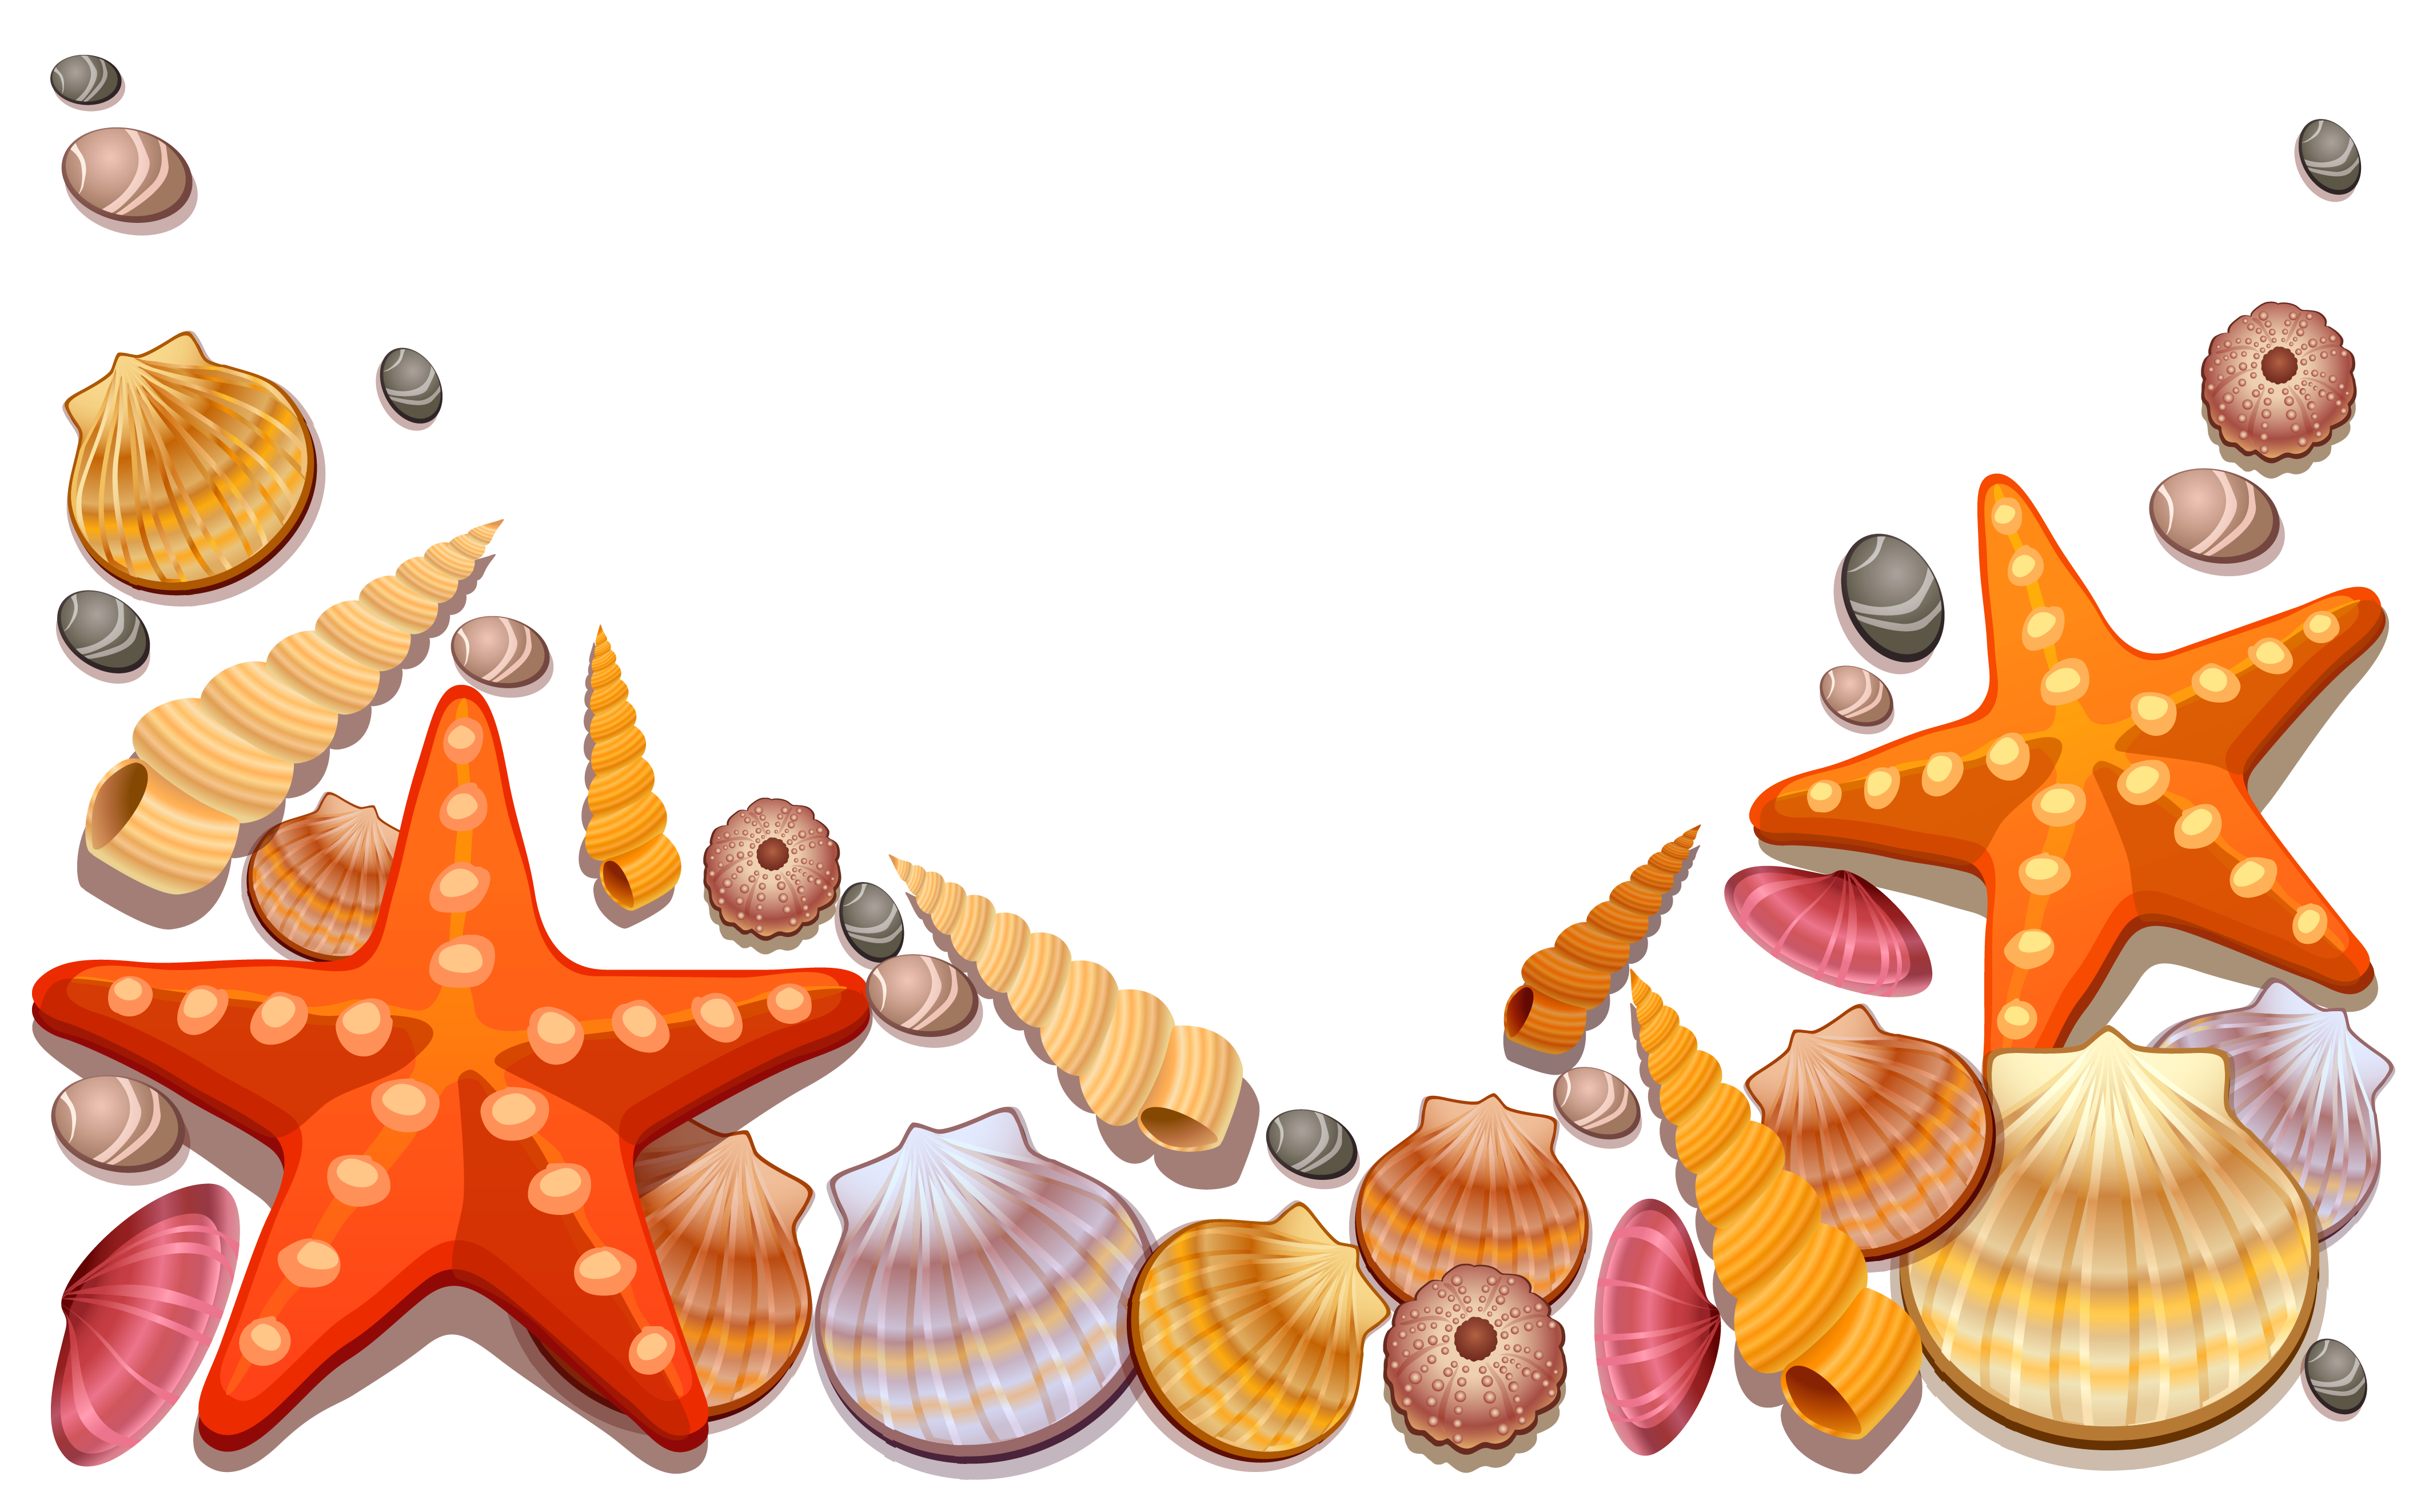 Vector clipart free download svg freeuse library Seashell Clip art - Sea Shells Decor PNG Vector Clipart 4242*2645 ... svg freeuse library